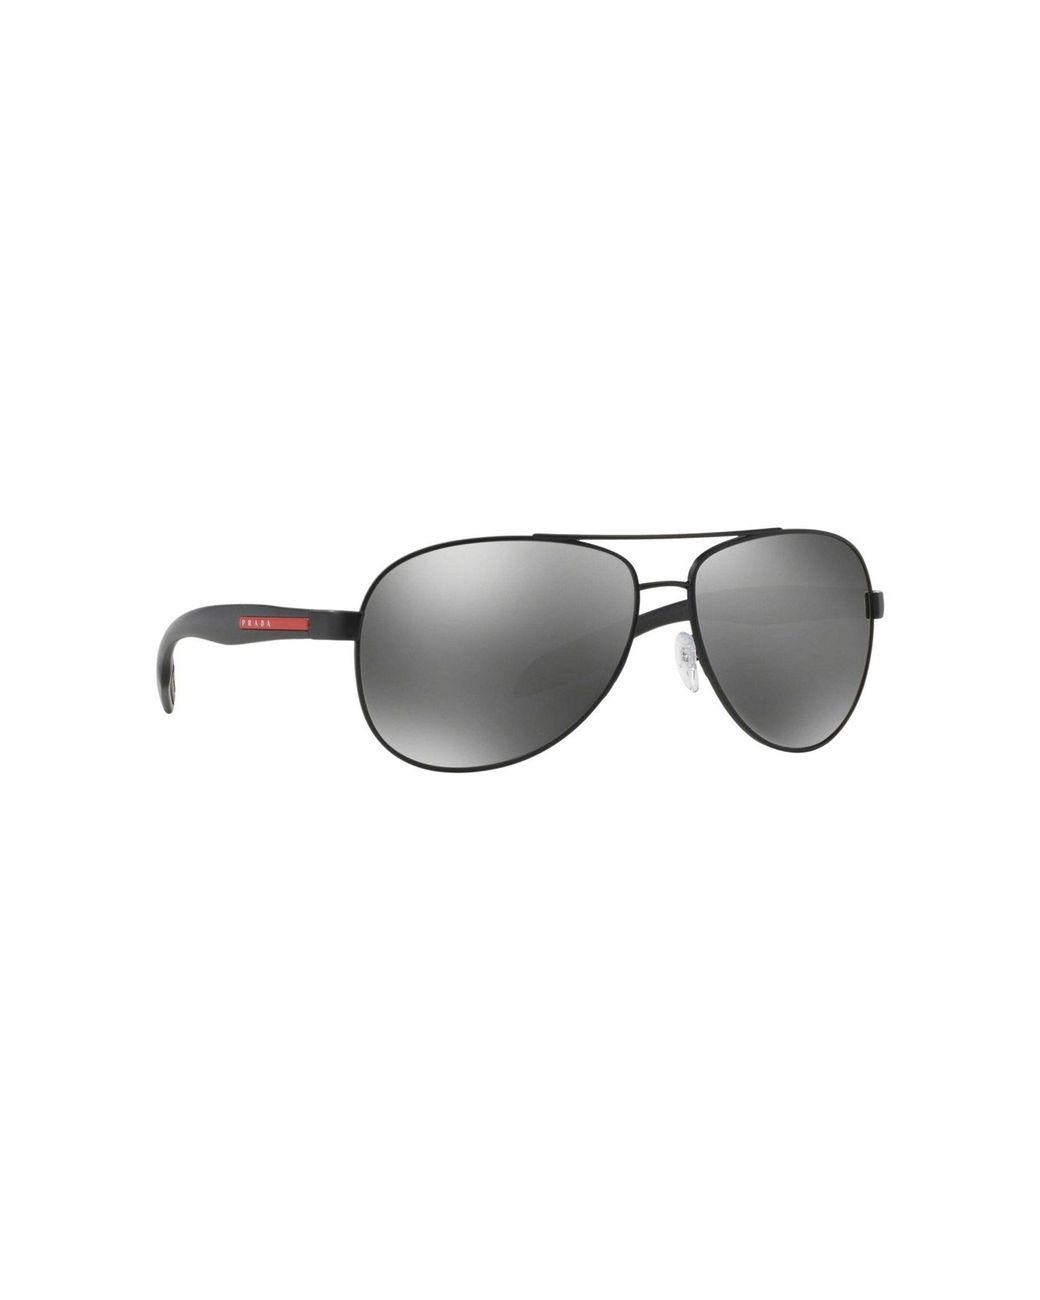 bcb69260e7a1 Prada Black Ps53ps Pilot Sunglasses in Black for Men - Lyst